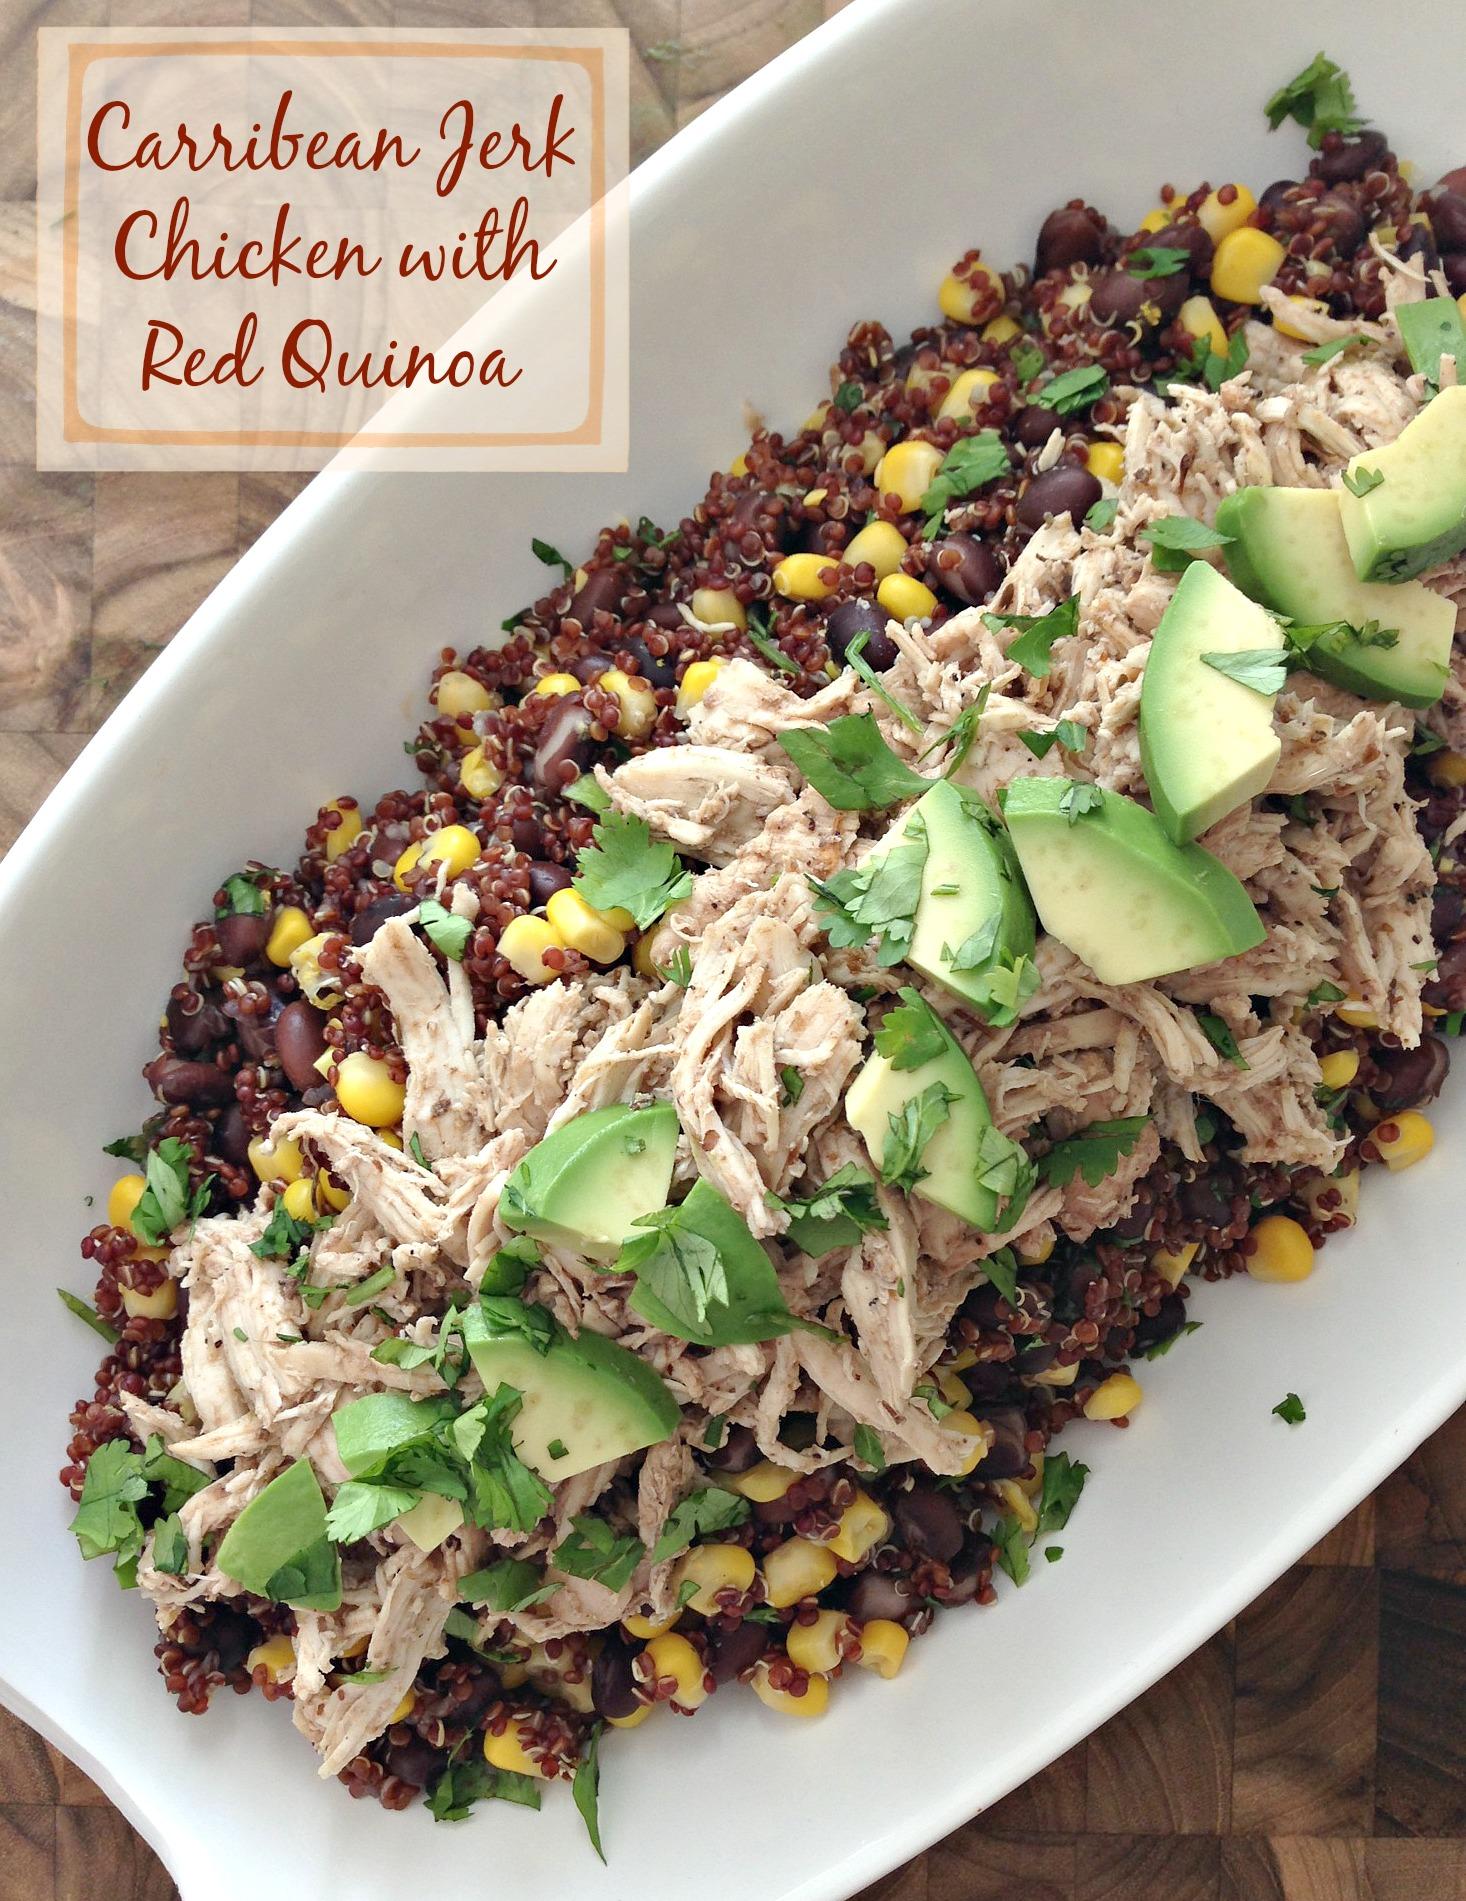 Slow Cooker Caribbean Jerk Chicken with Red Quinoa